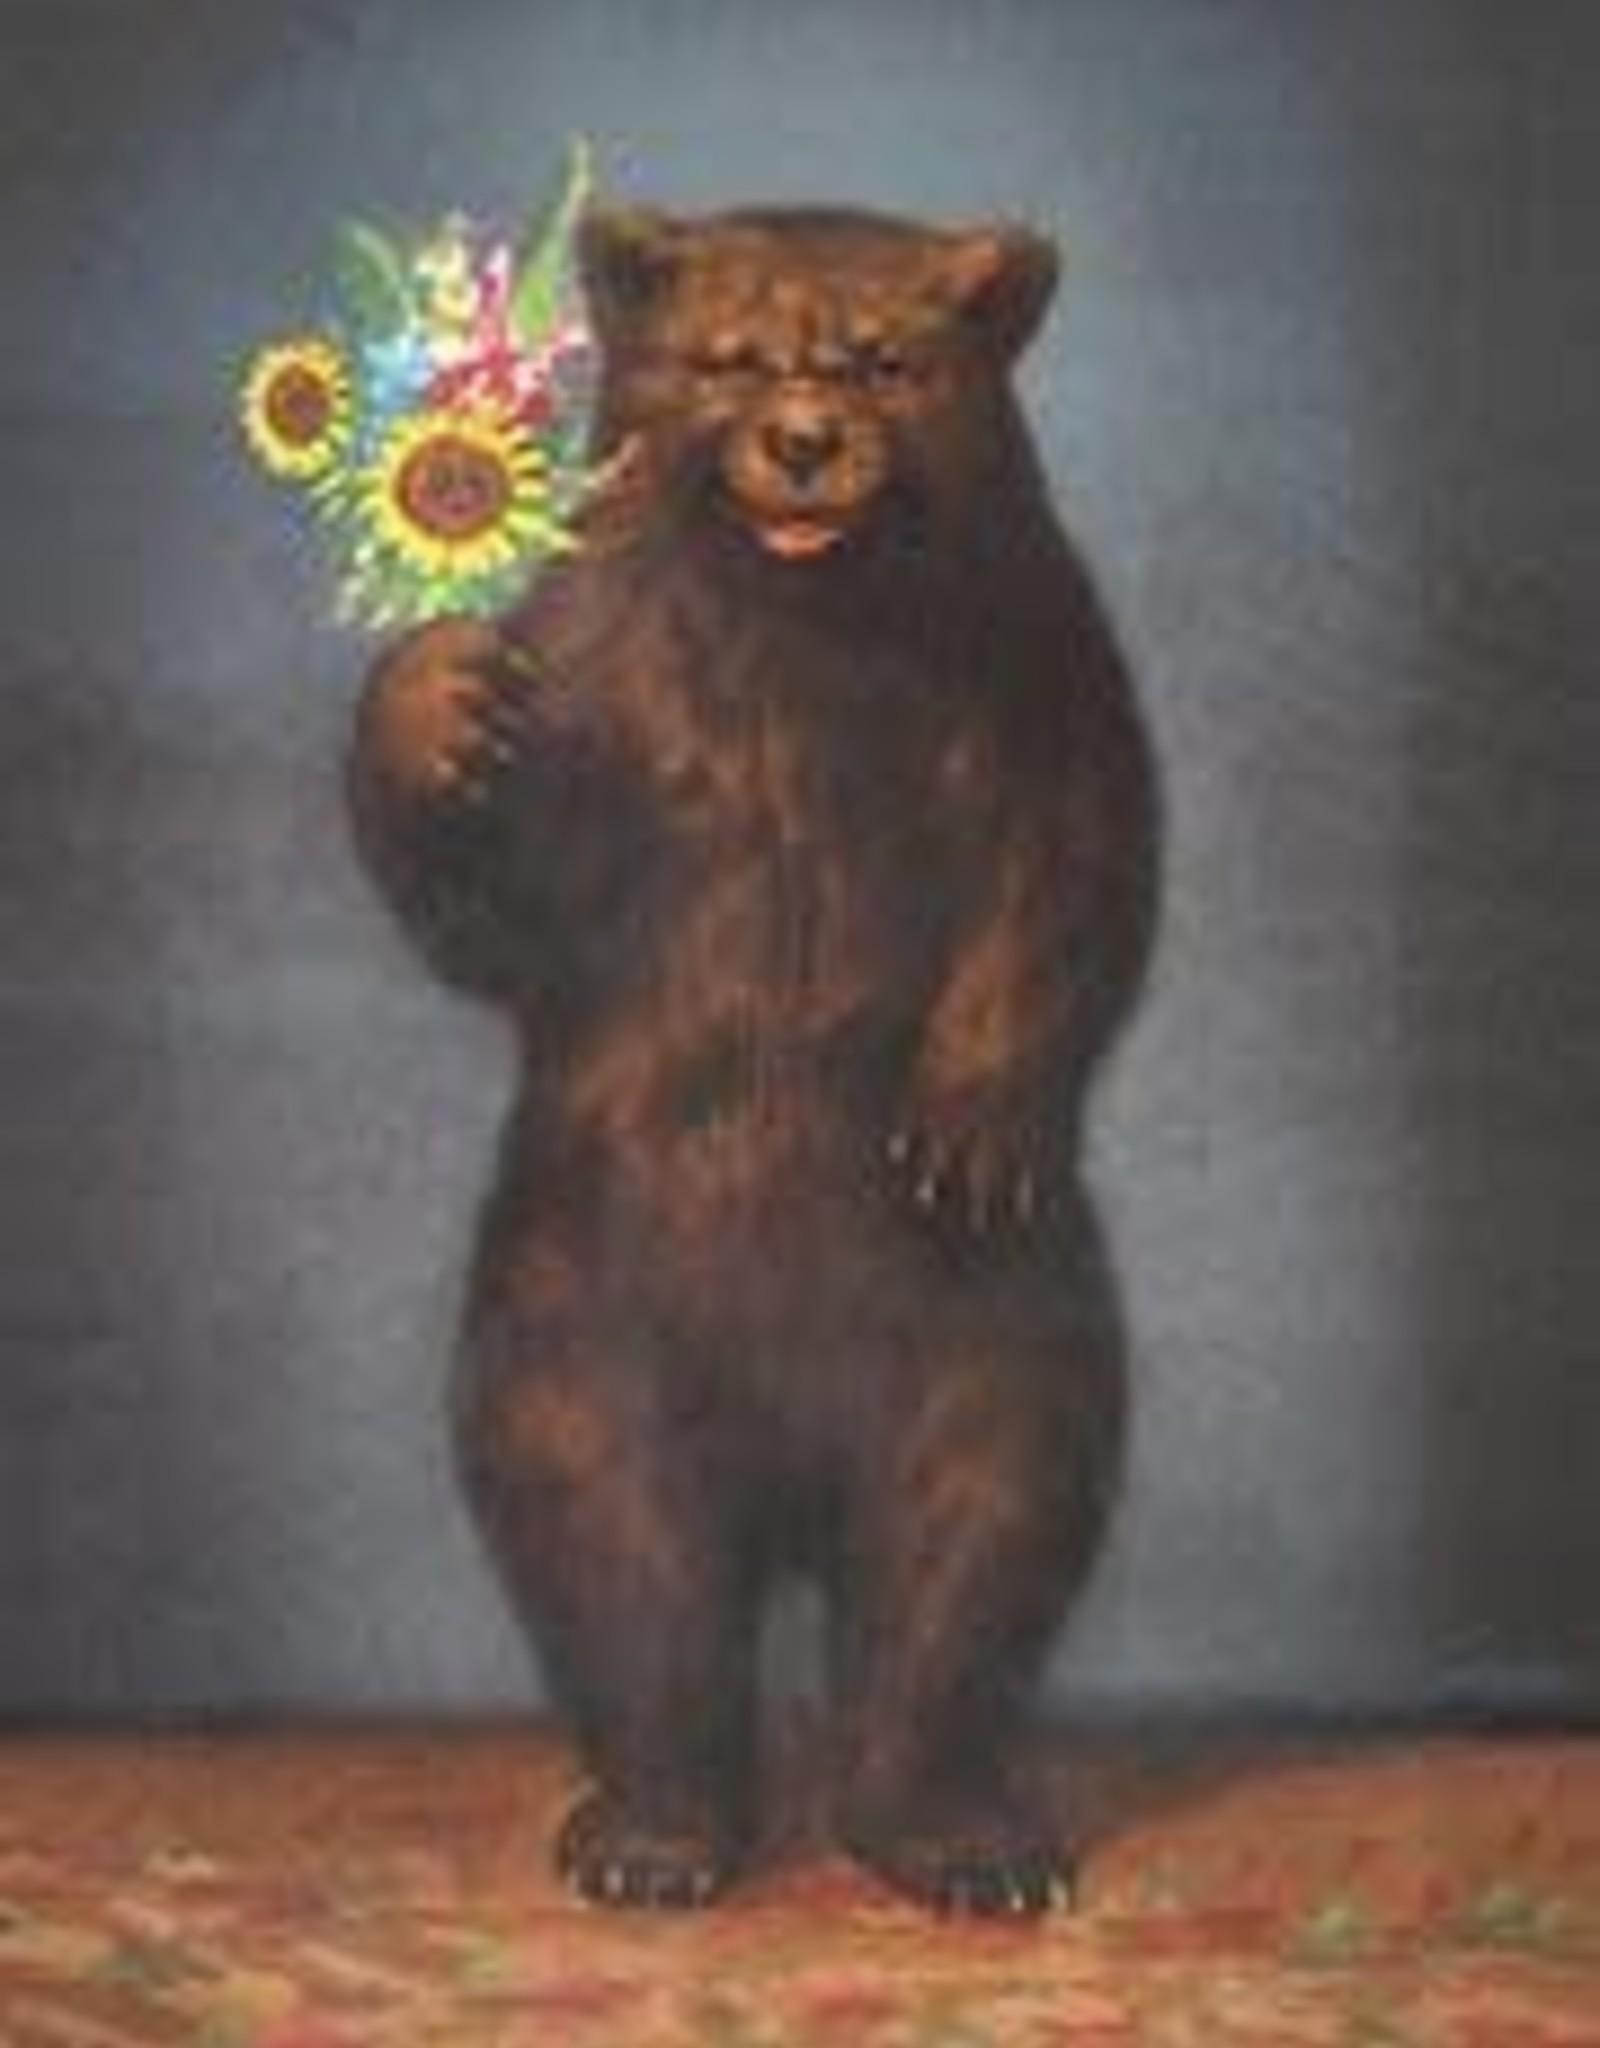 CARD-BEAR WITH FLOWERS